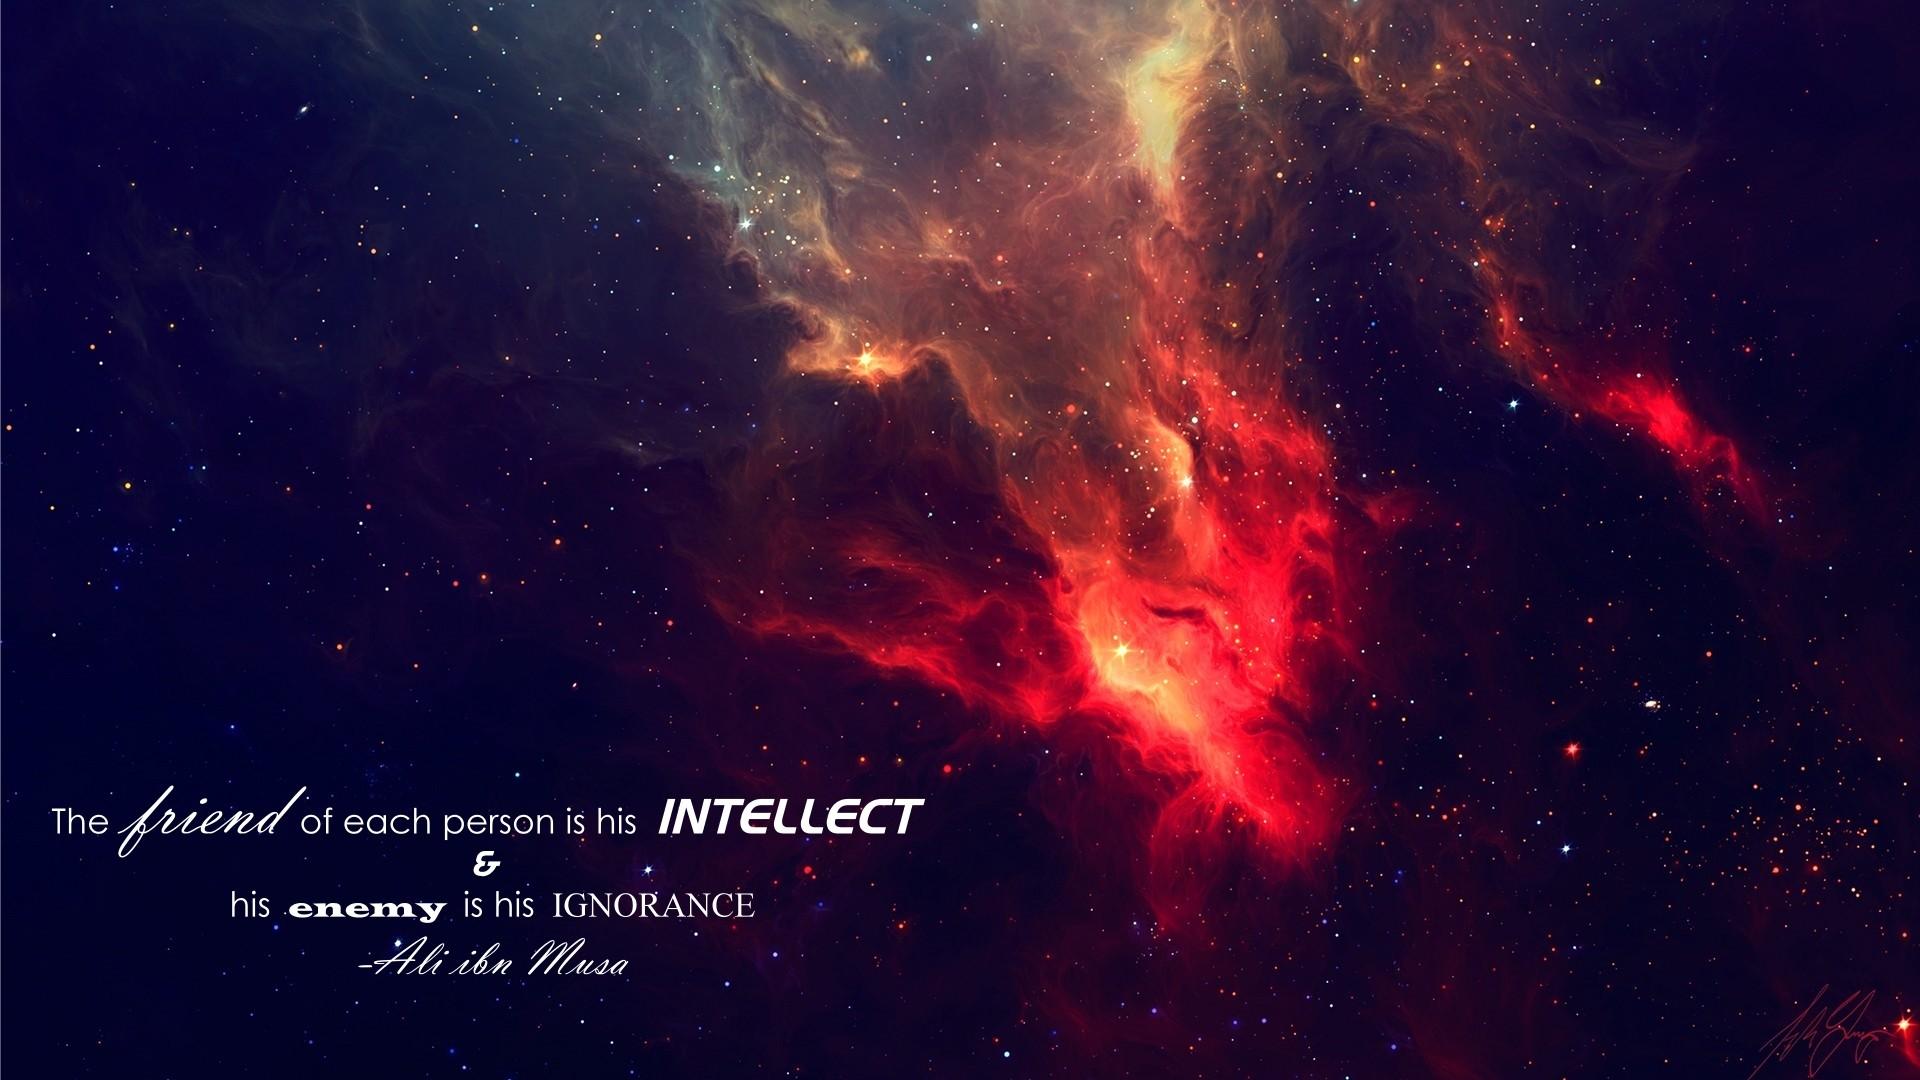 1920x1080 px Imam Islam quote space stars 660158